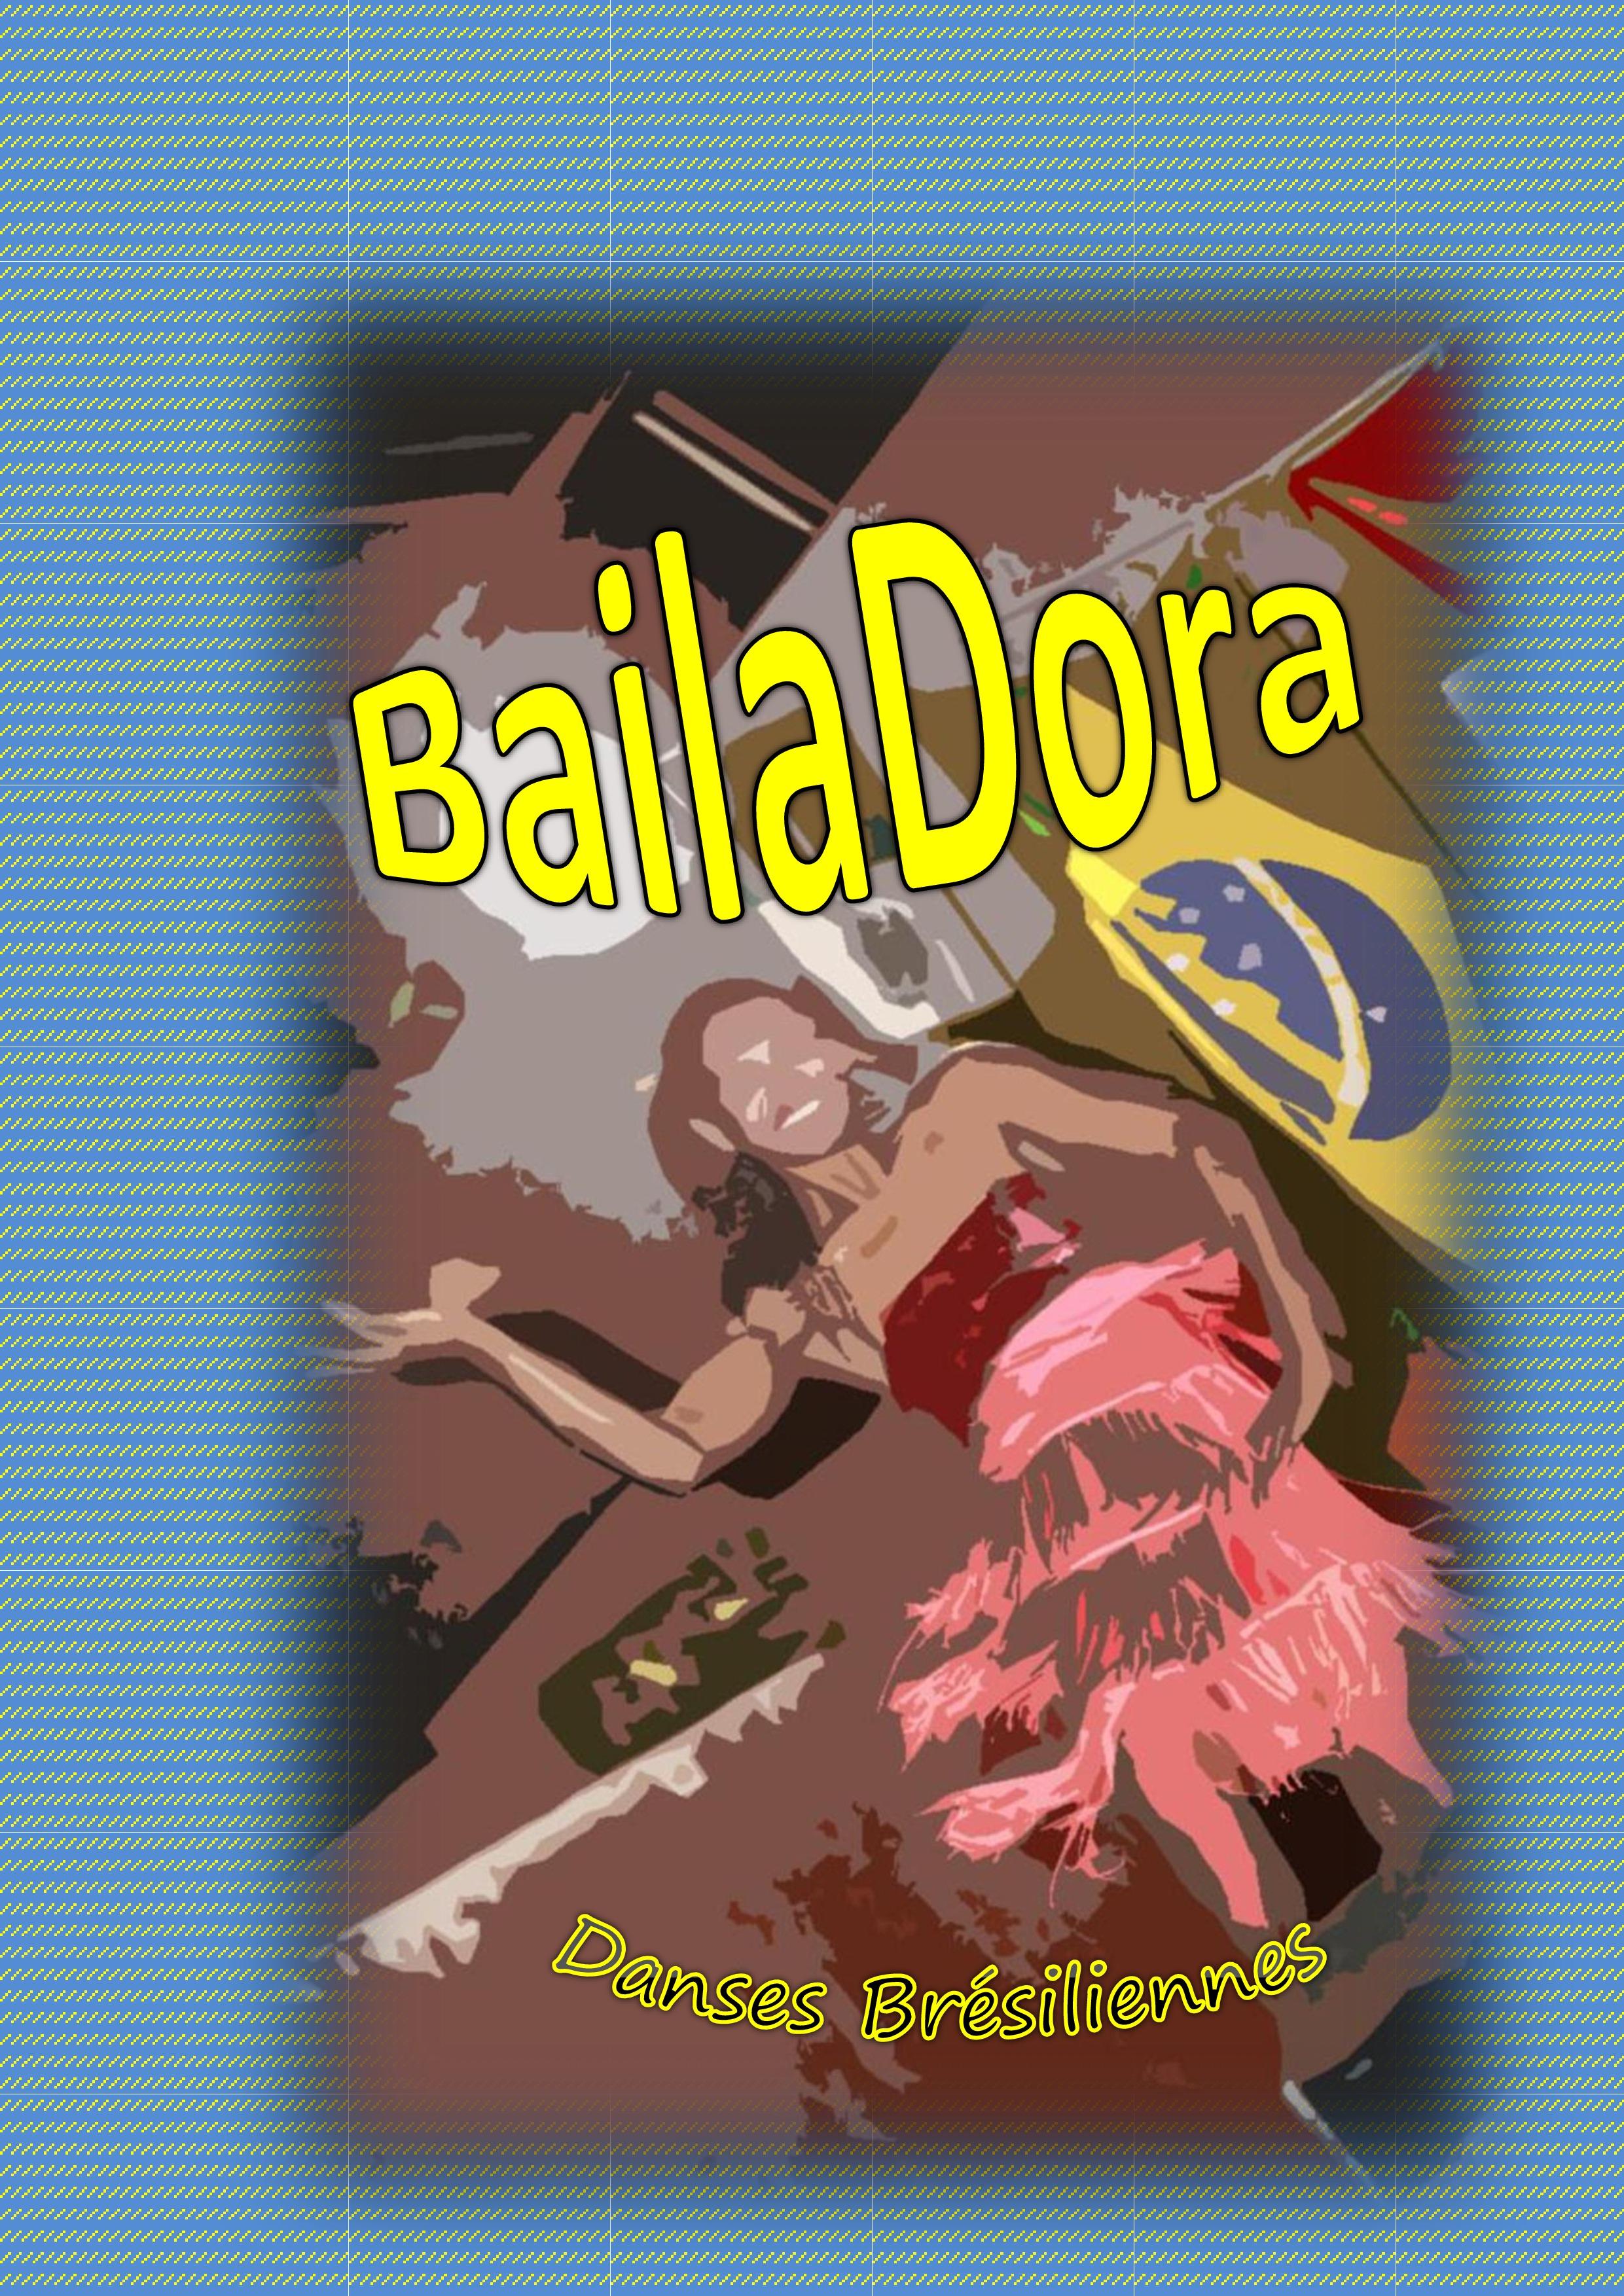 Logo_BailaDora_1-page-0-1473182492.jpg